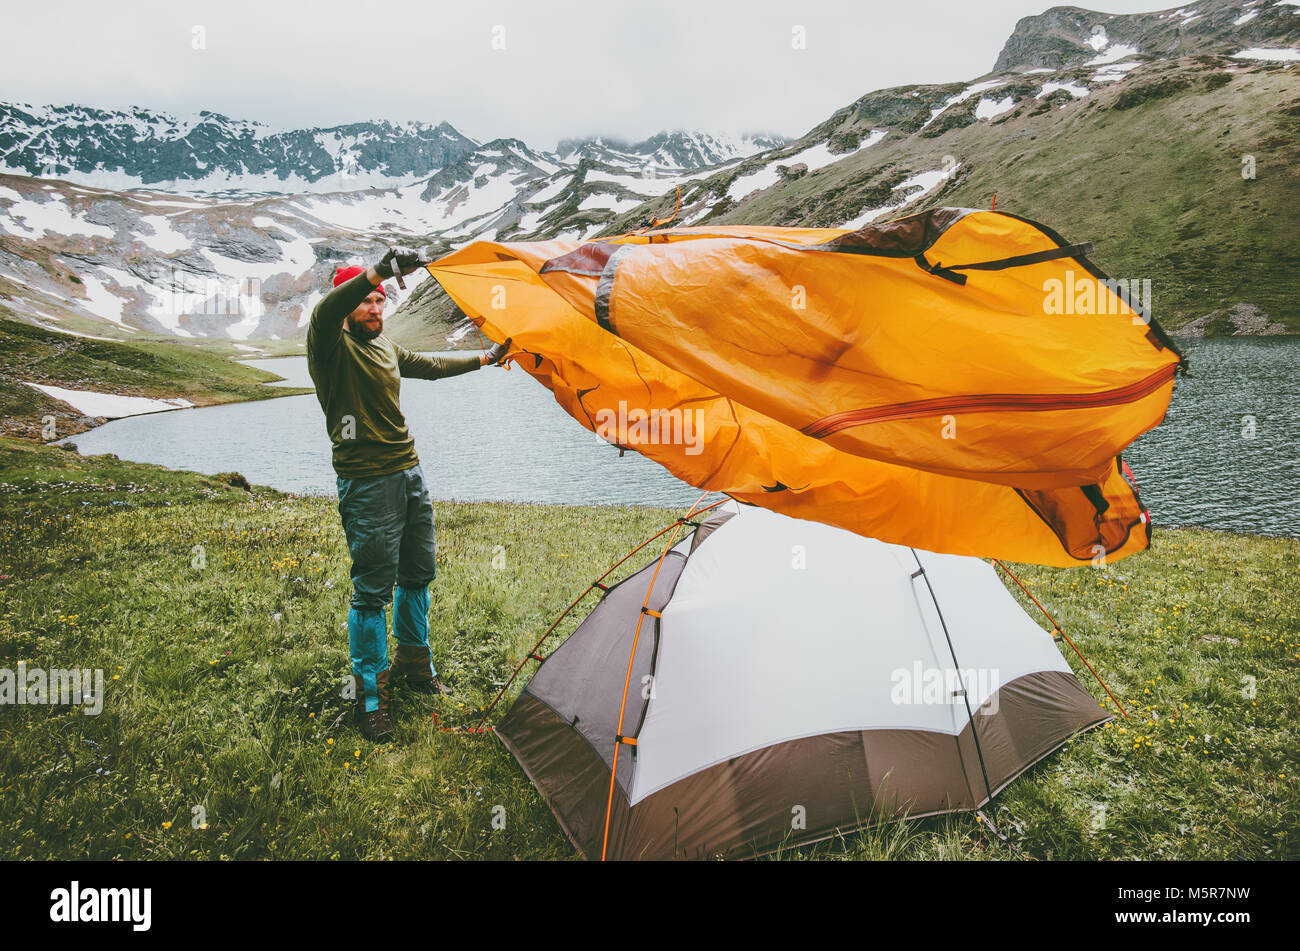 Mann Abenteurer pitching Zelt Camping outdoor Reise überleben Lifestyle-konzept Sommer reise Ferien in den Stockbild